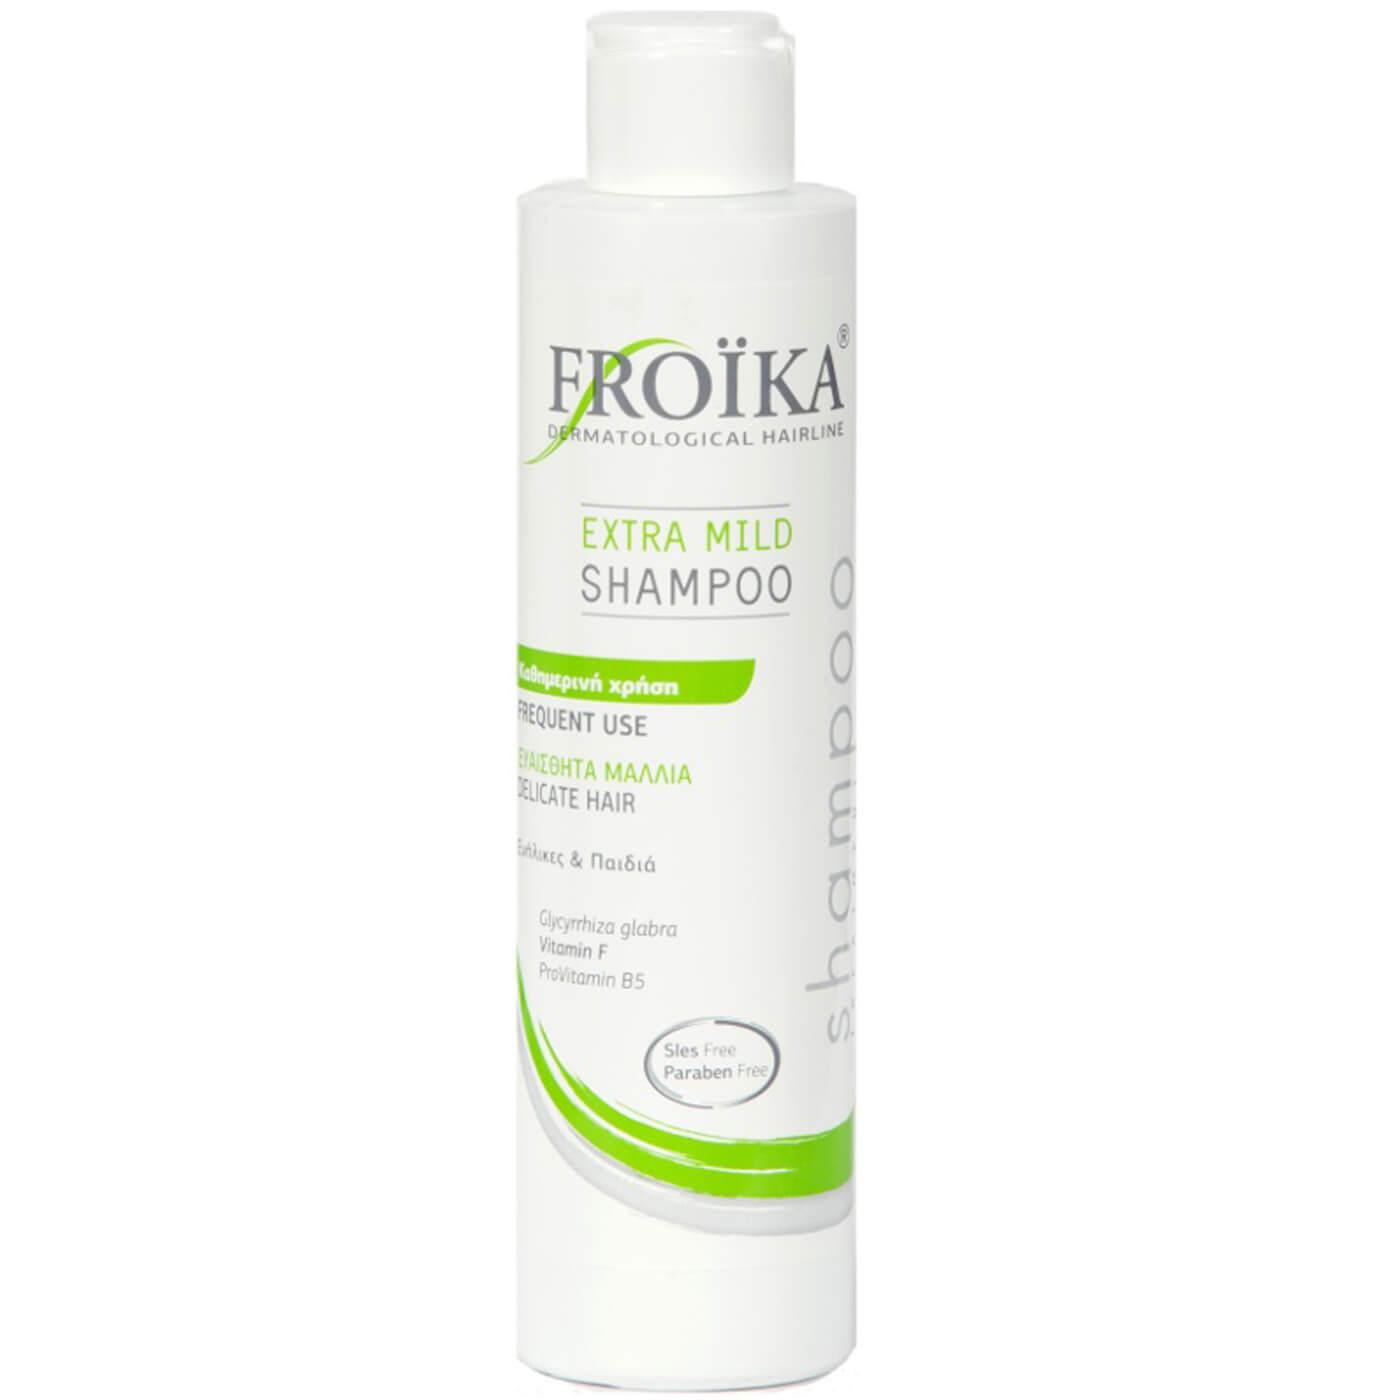 Froika Extra Mild Shampoo Απαλό, μη Ερεθιστικό Σαμπουάν, Ειδικά Σχεδιασμένο για Ευαίσθητα Μαλλιά & Συχνή Χρήση 200ml